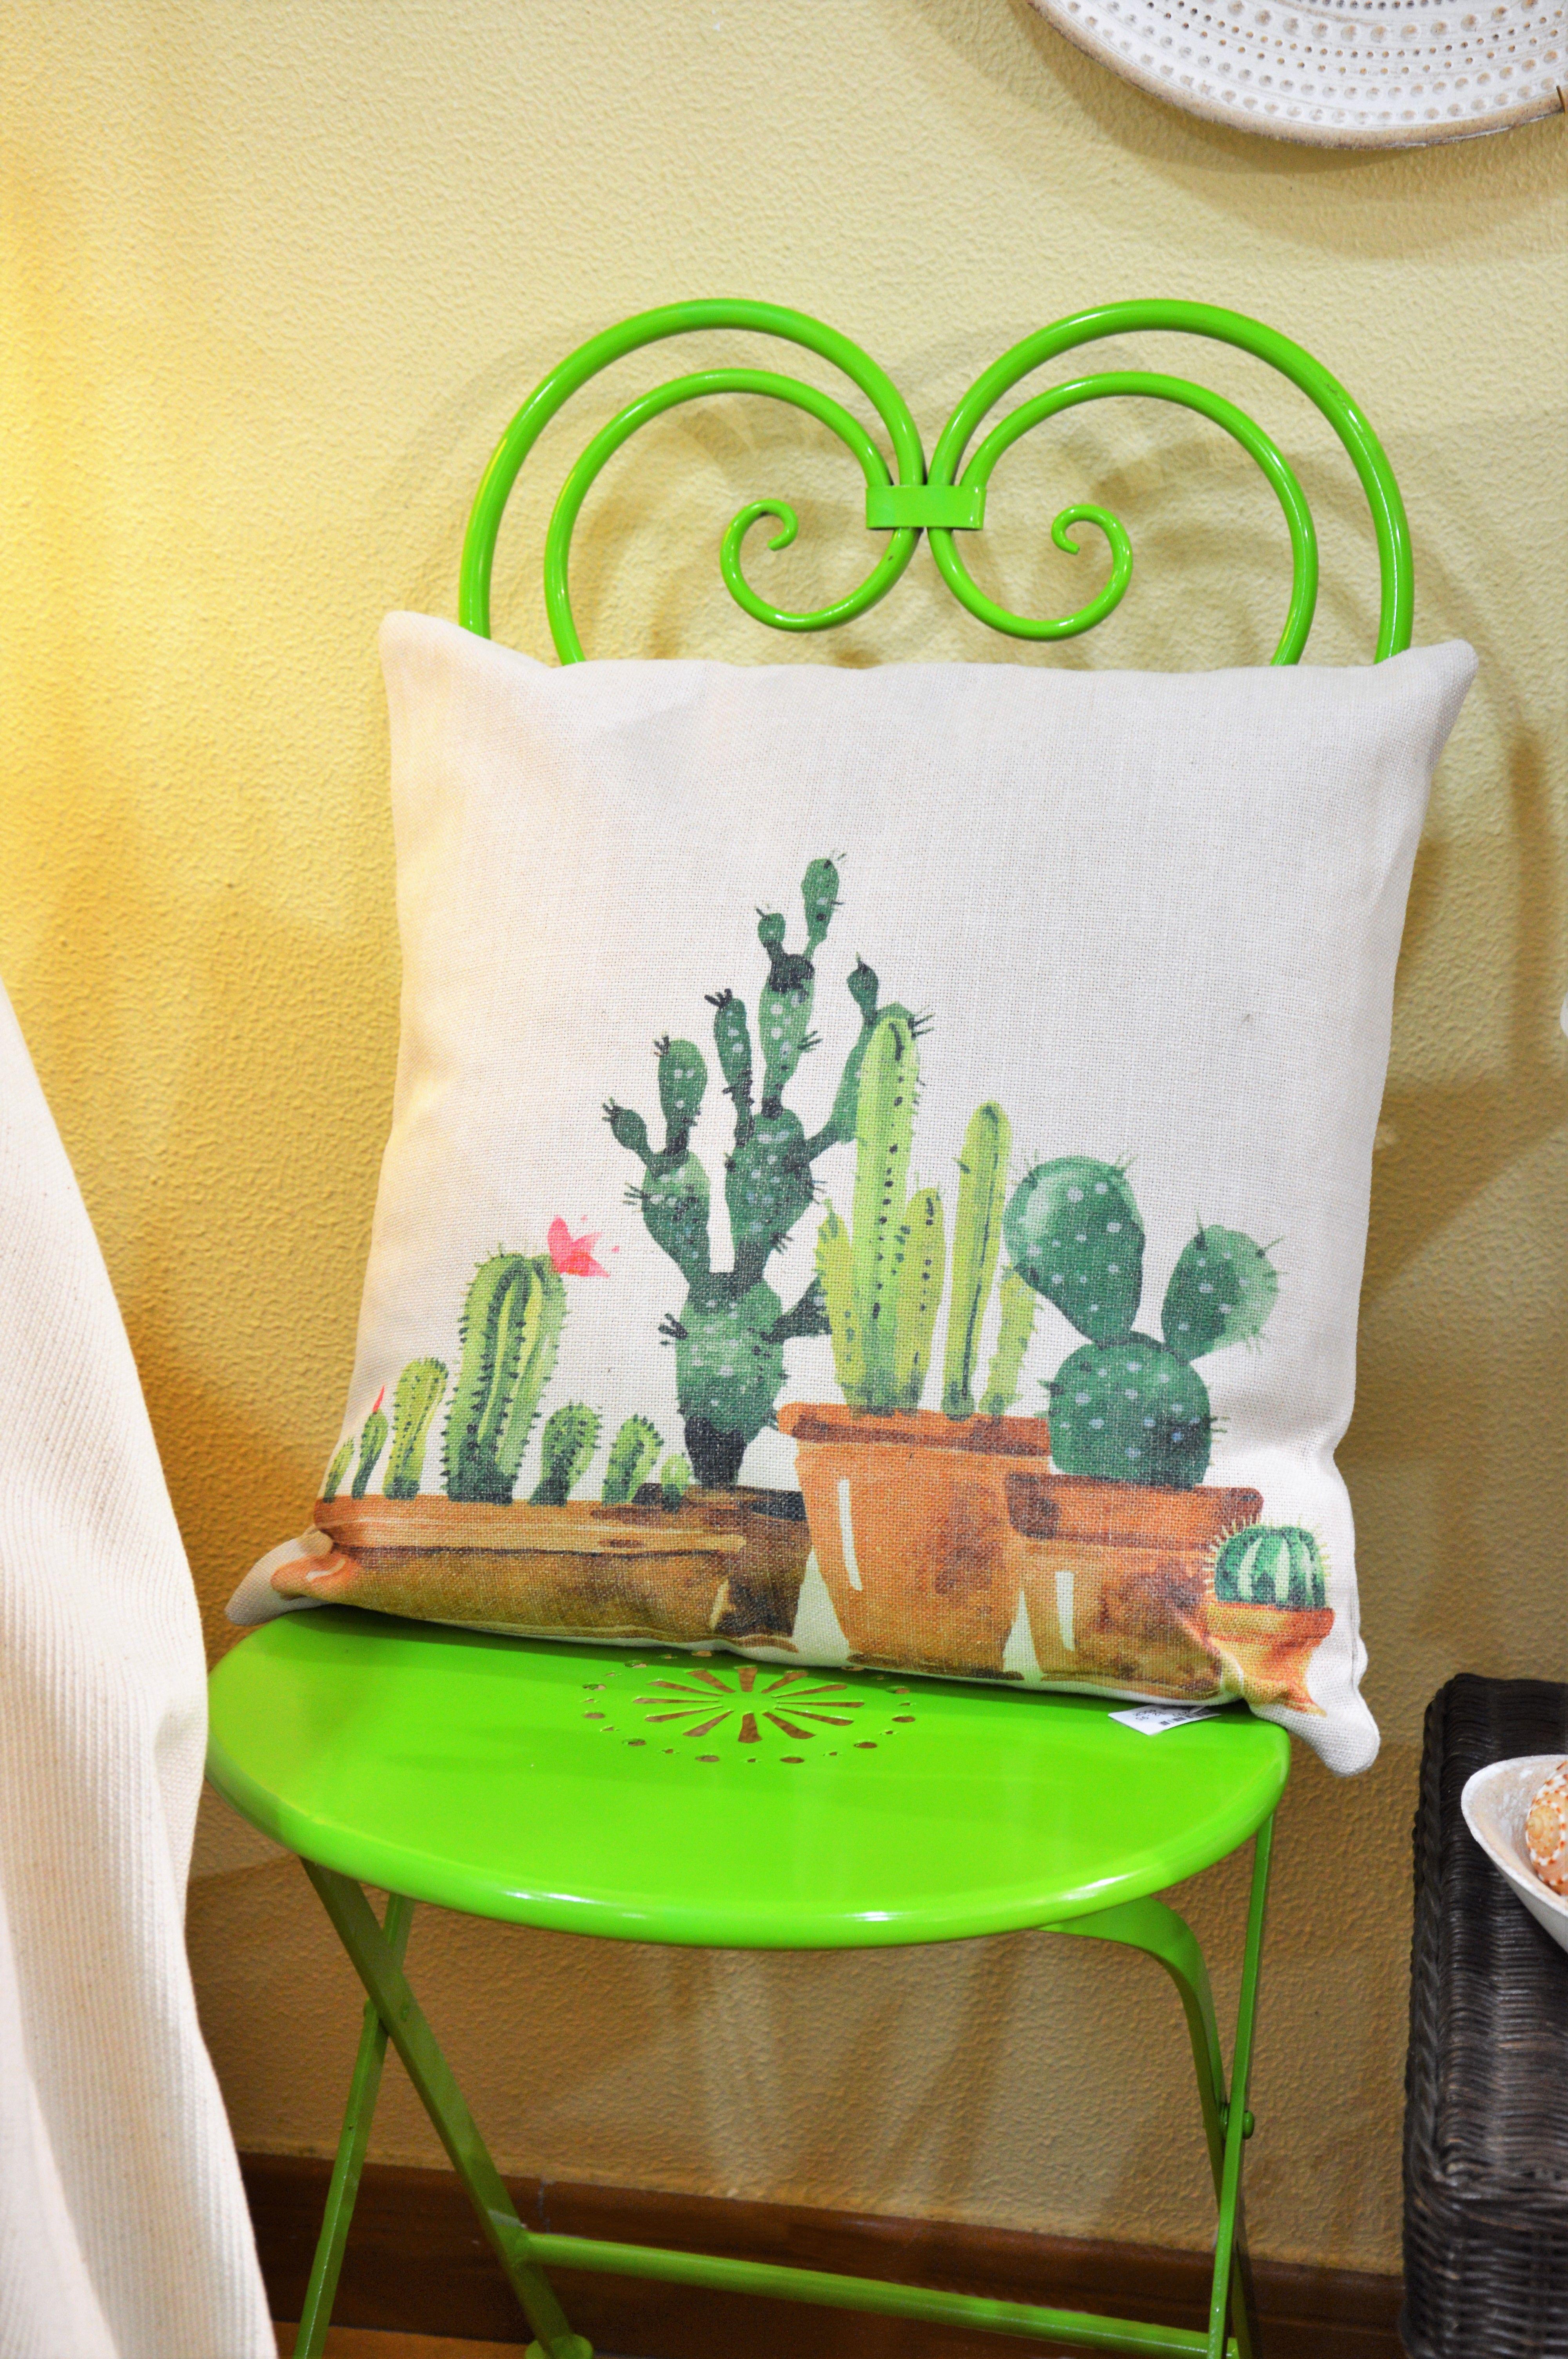 Sillas jardn jardin sillas cactus cojines mueblesjardin